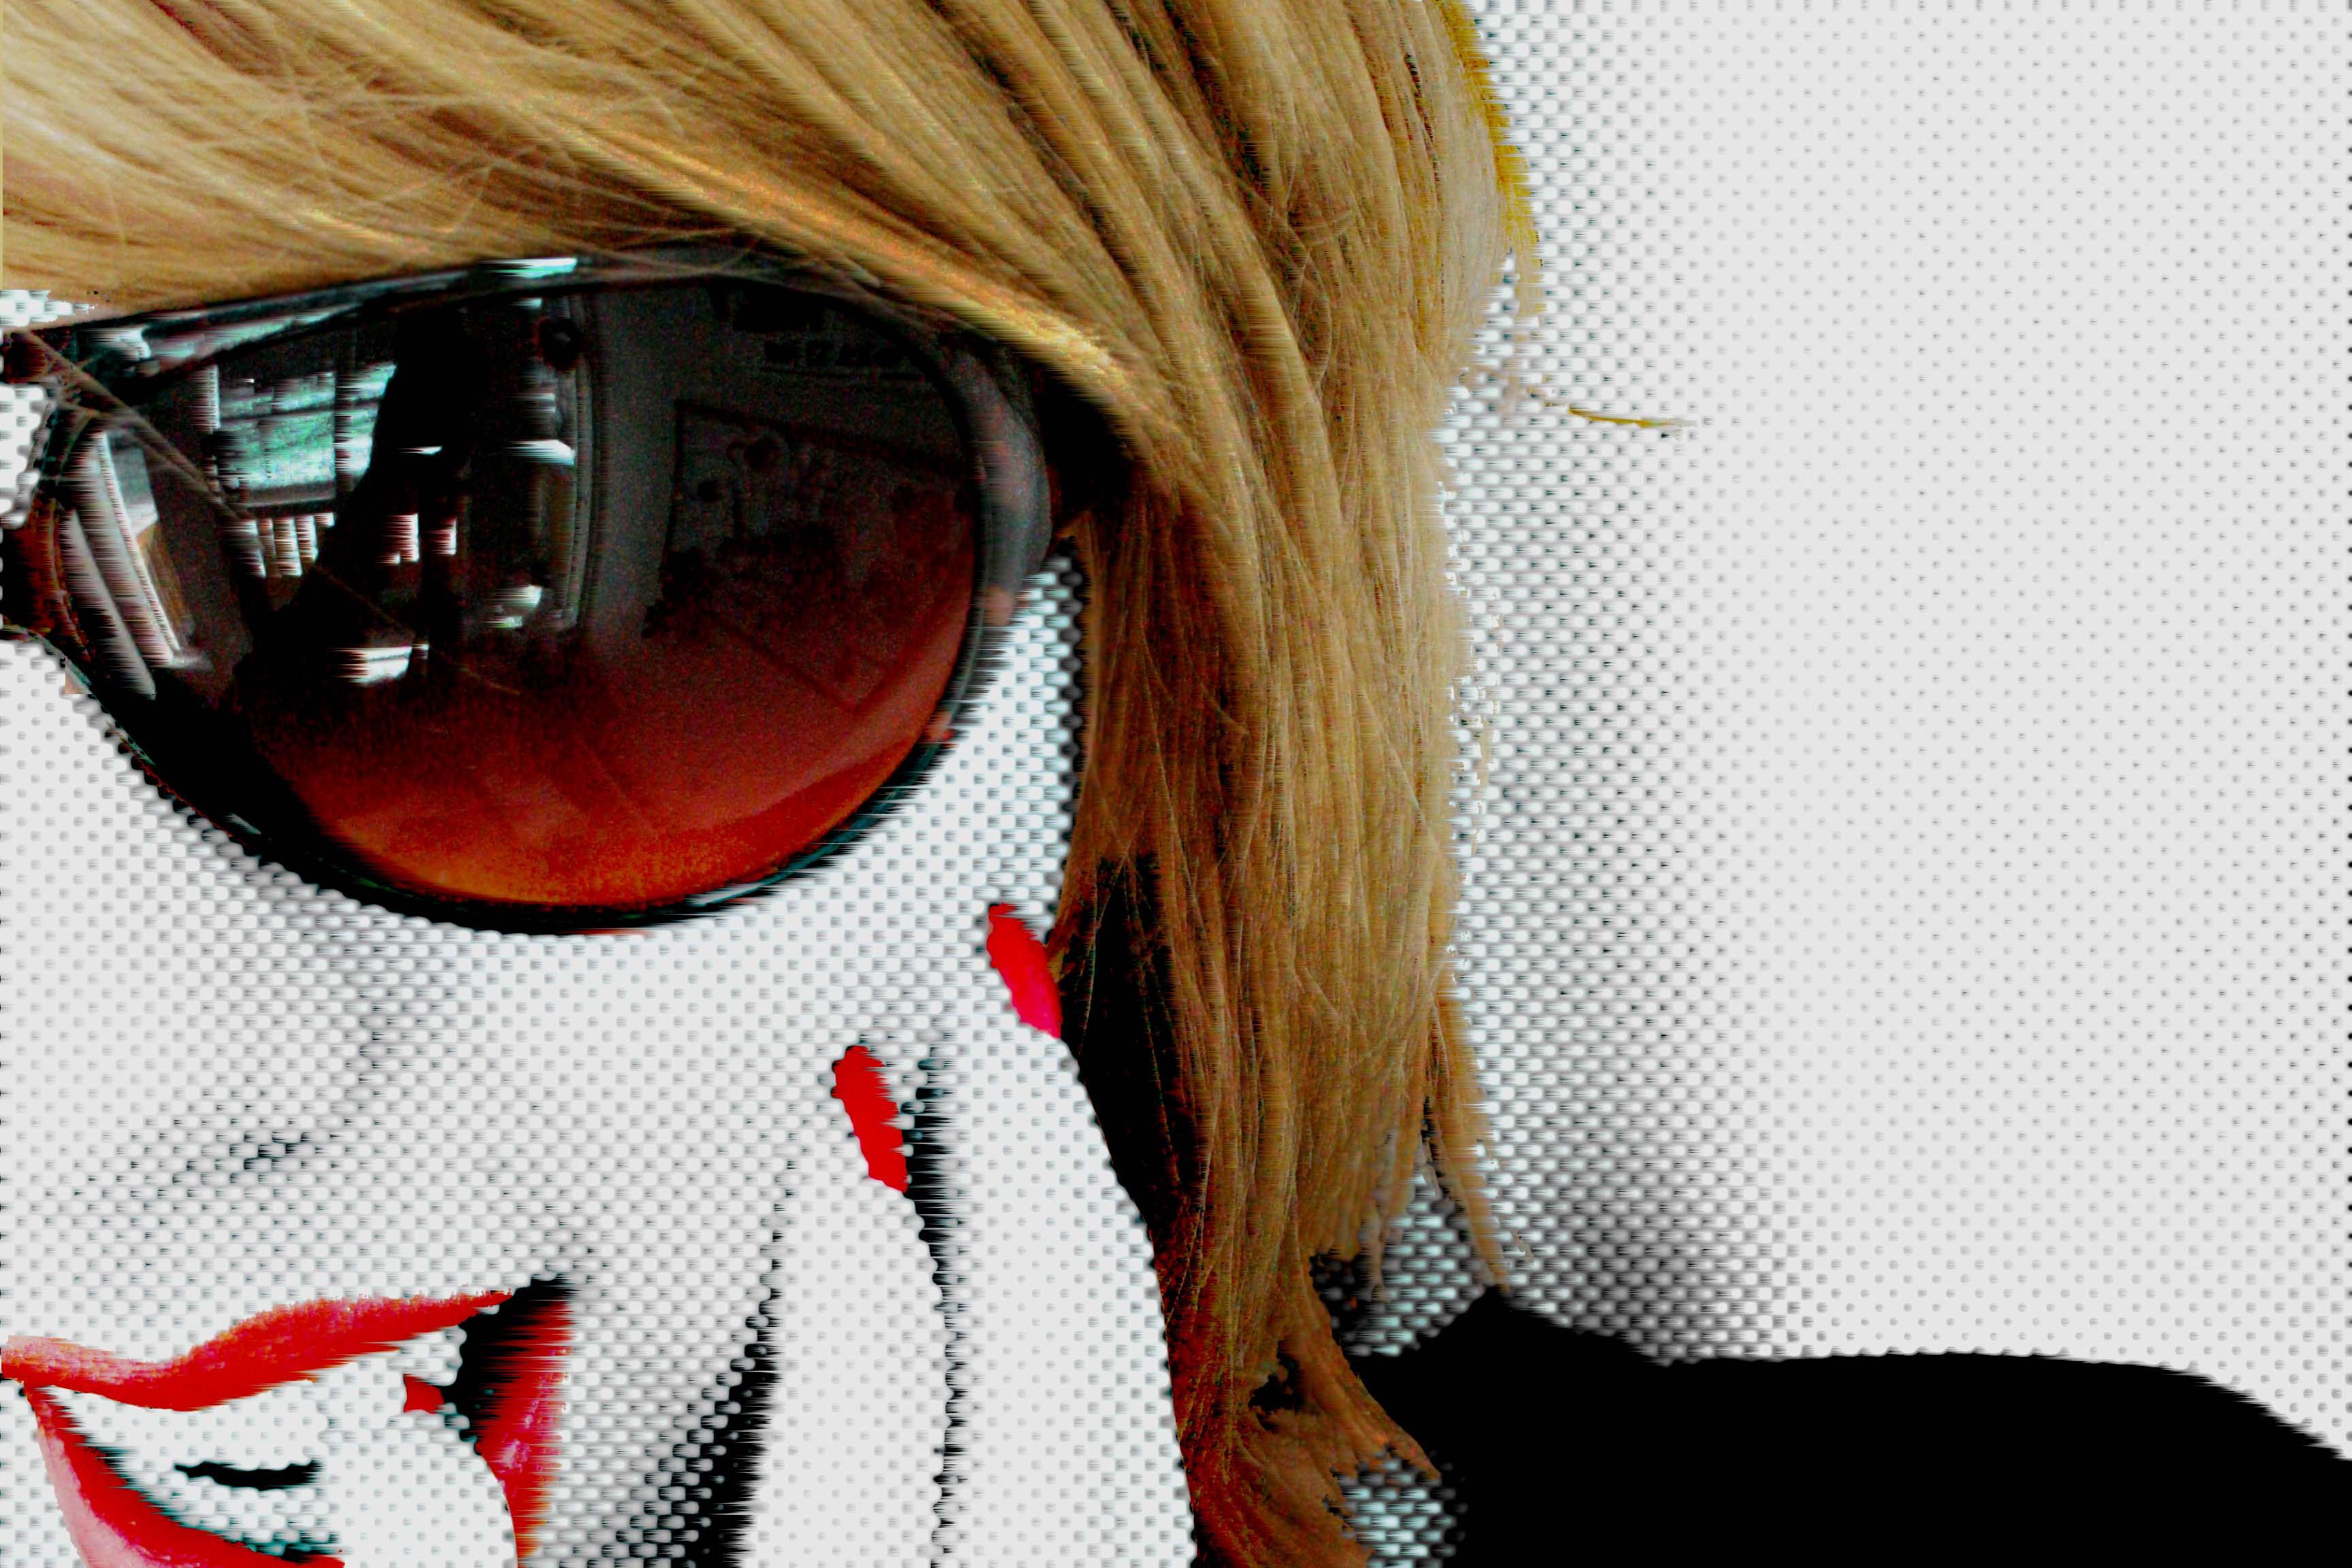 http://fc06.deviantart.net/fs10/i/2006/083/8/1/Red_lips_by_sharpend.jpg